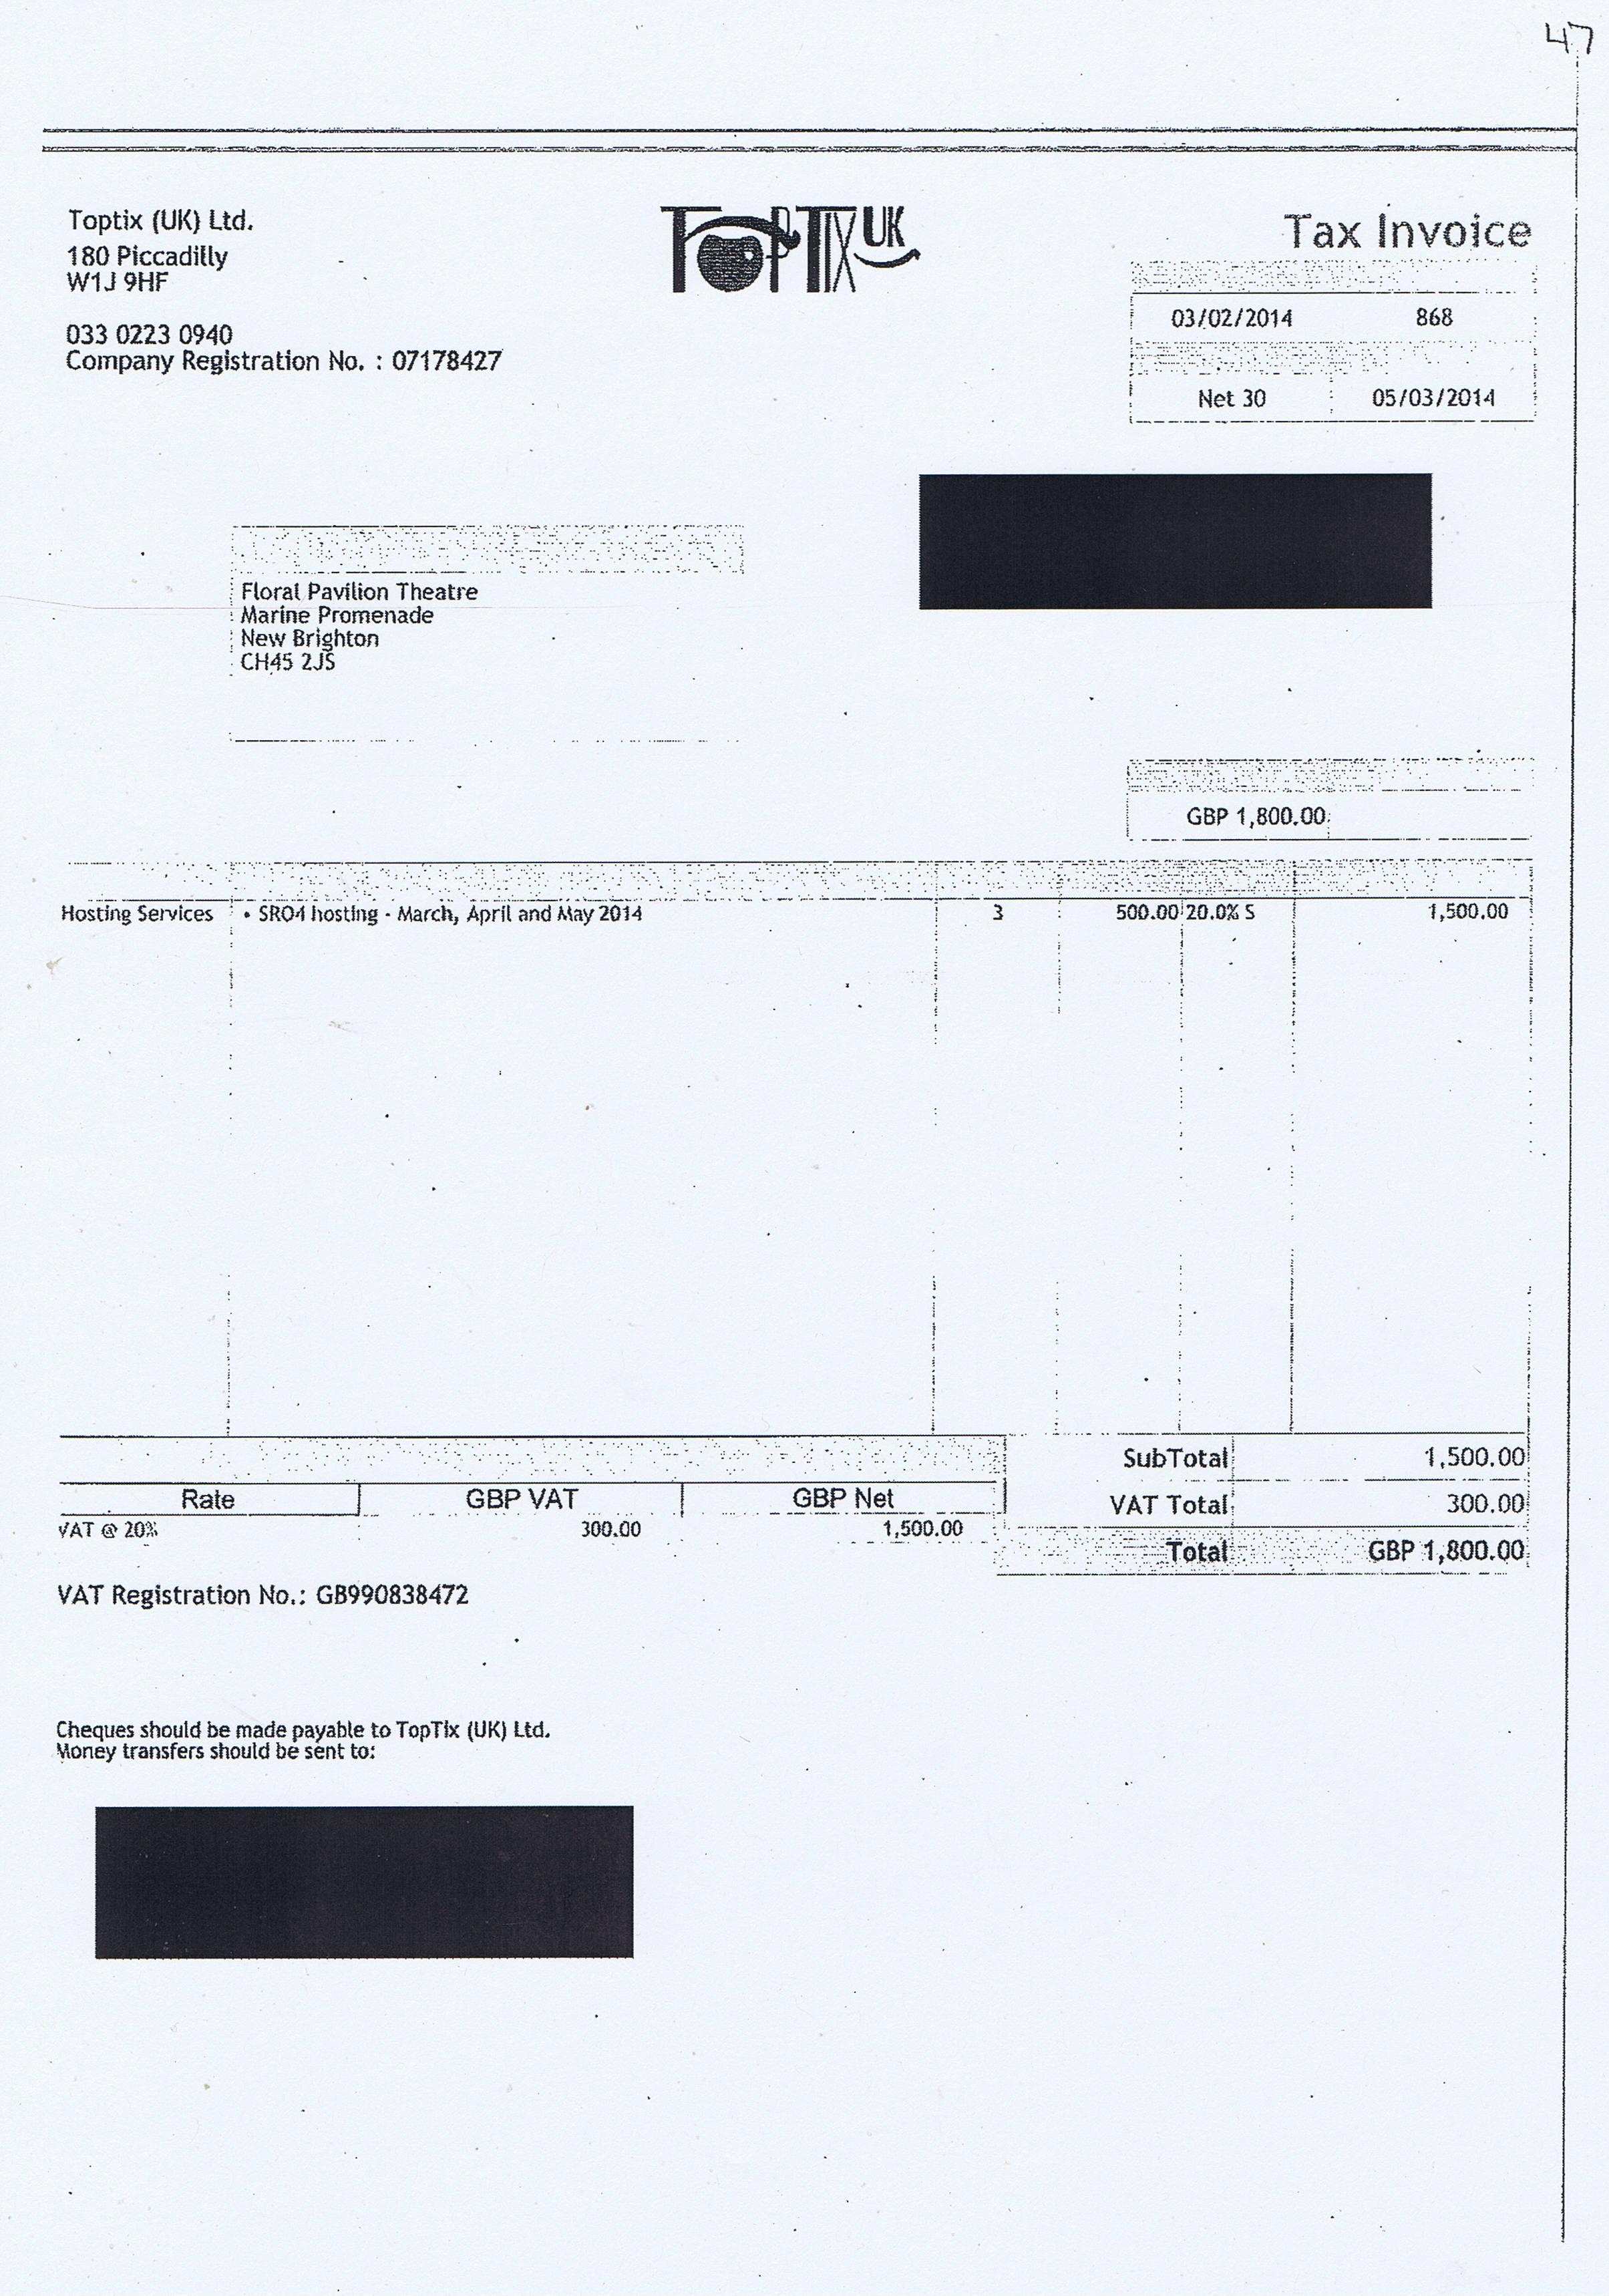 Wirral Council invoice 47 Toptix (UK) Ltd £1800